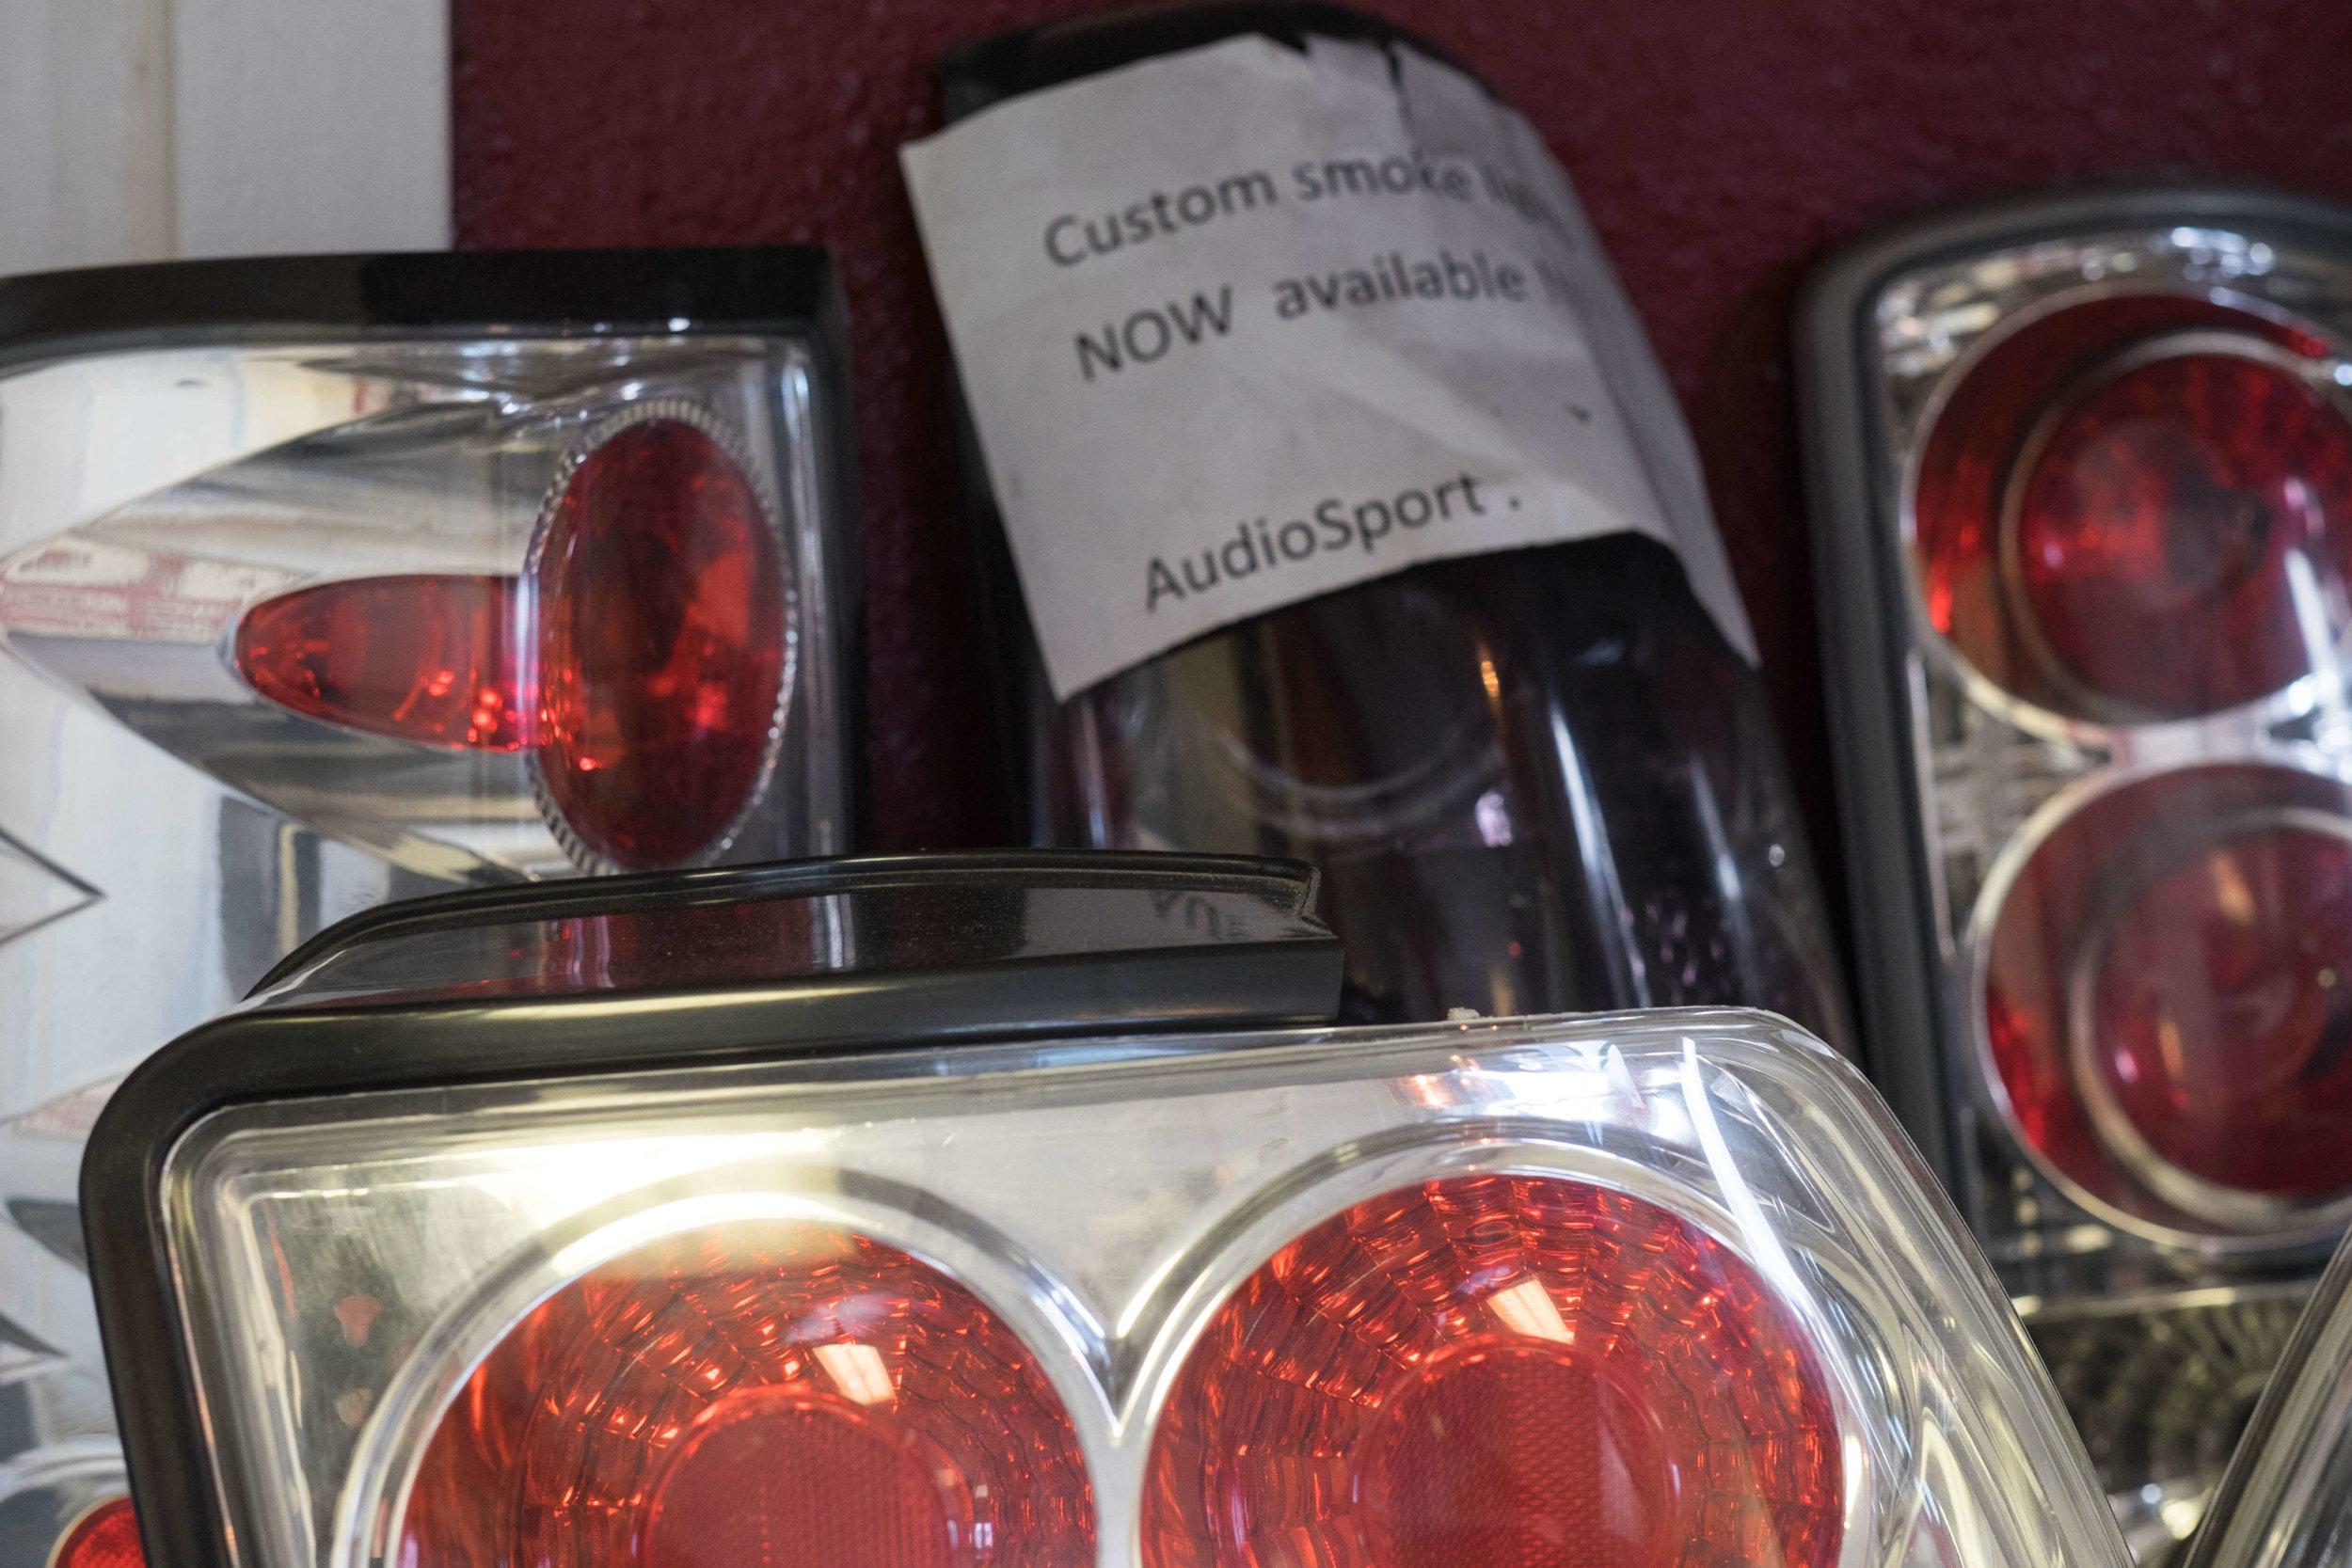 Get Custom Smoke Lights at Audiosport Escondido